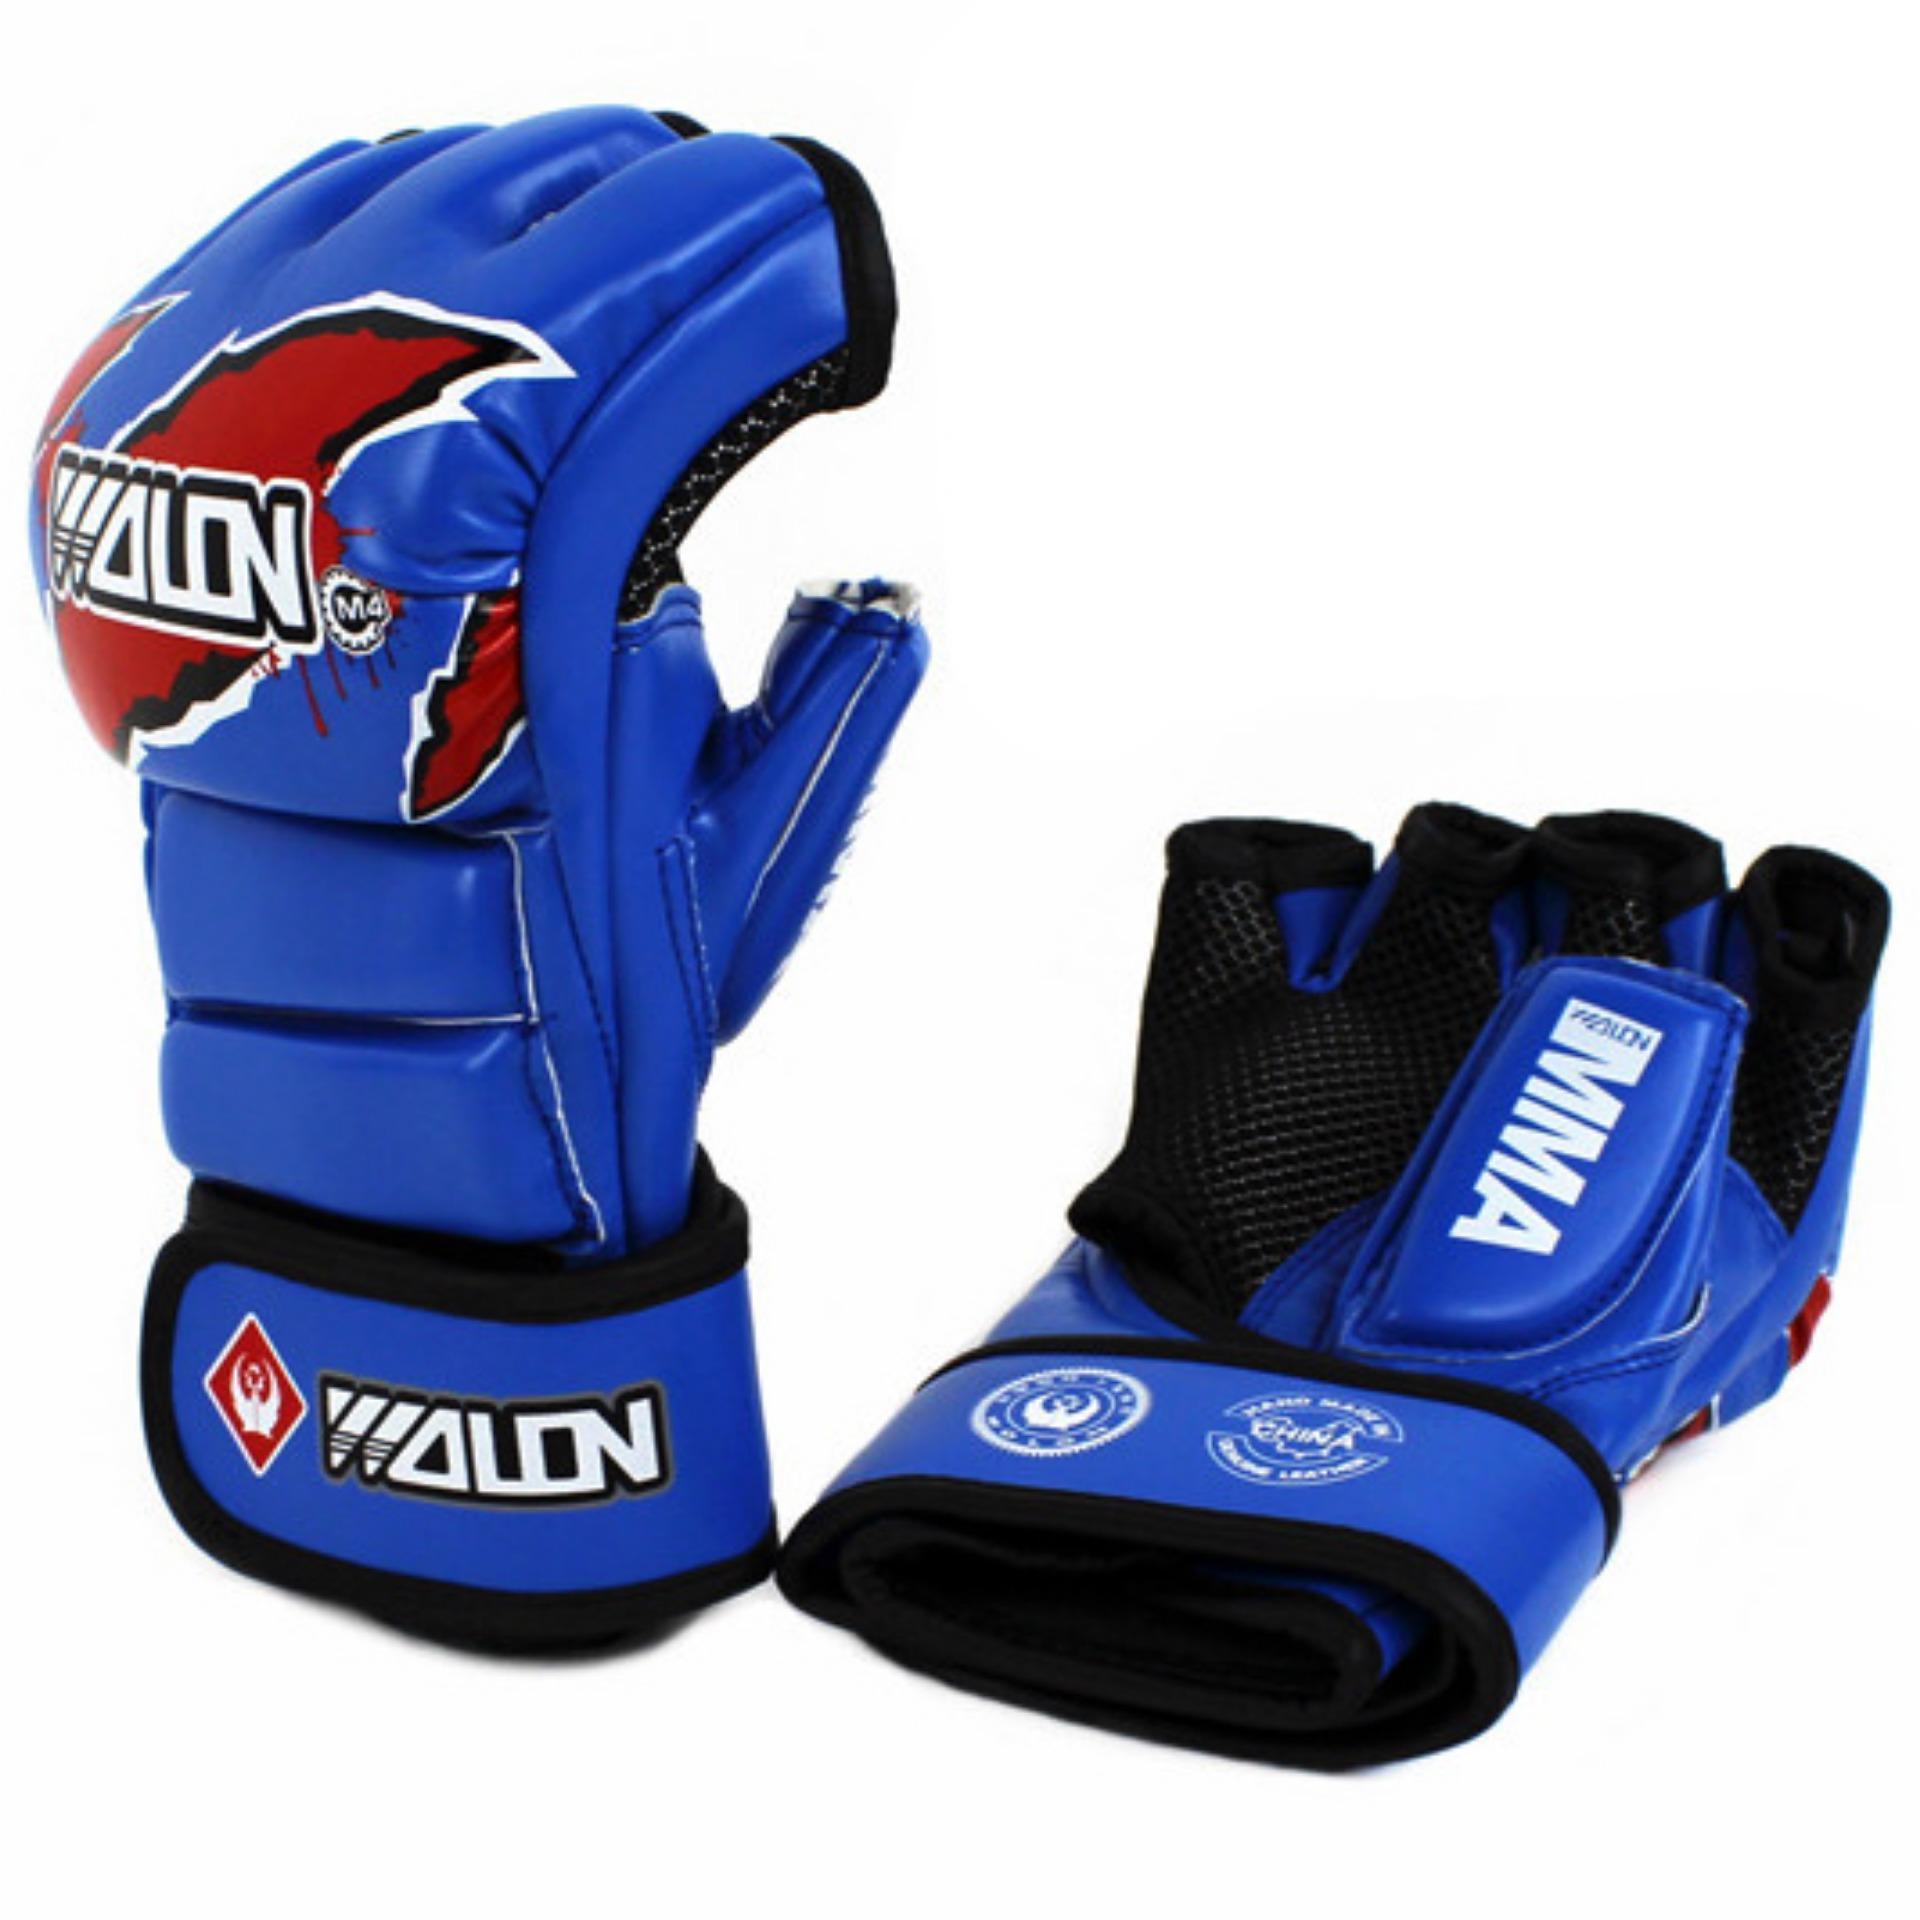 Găng Tay MMA Wolon Fighter Gloves (Xanh)